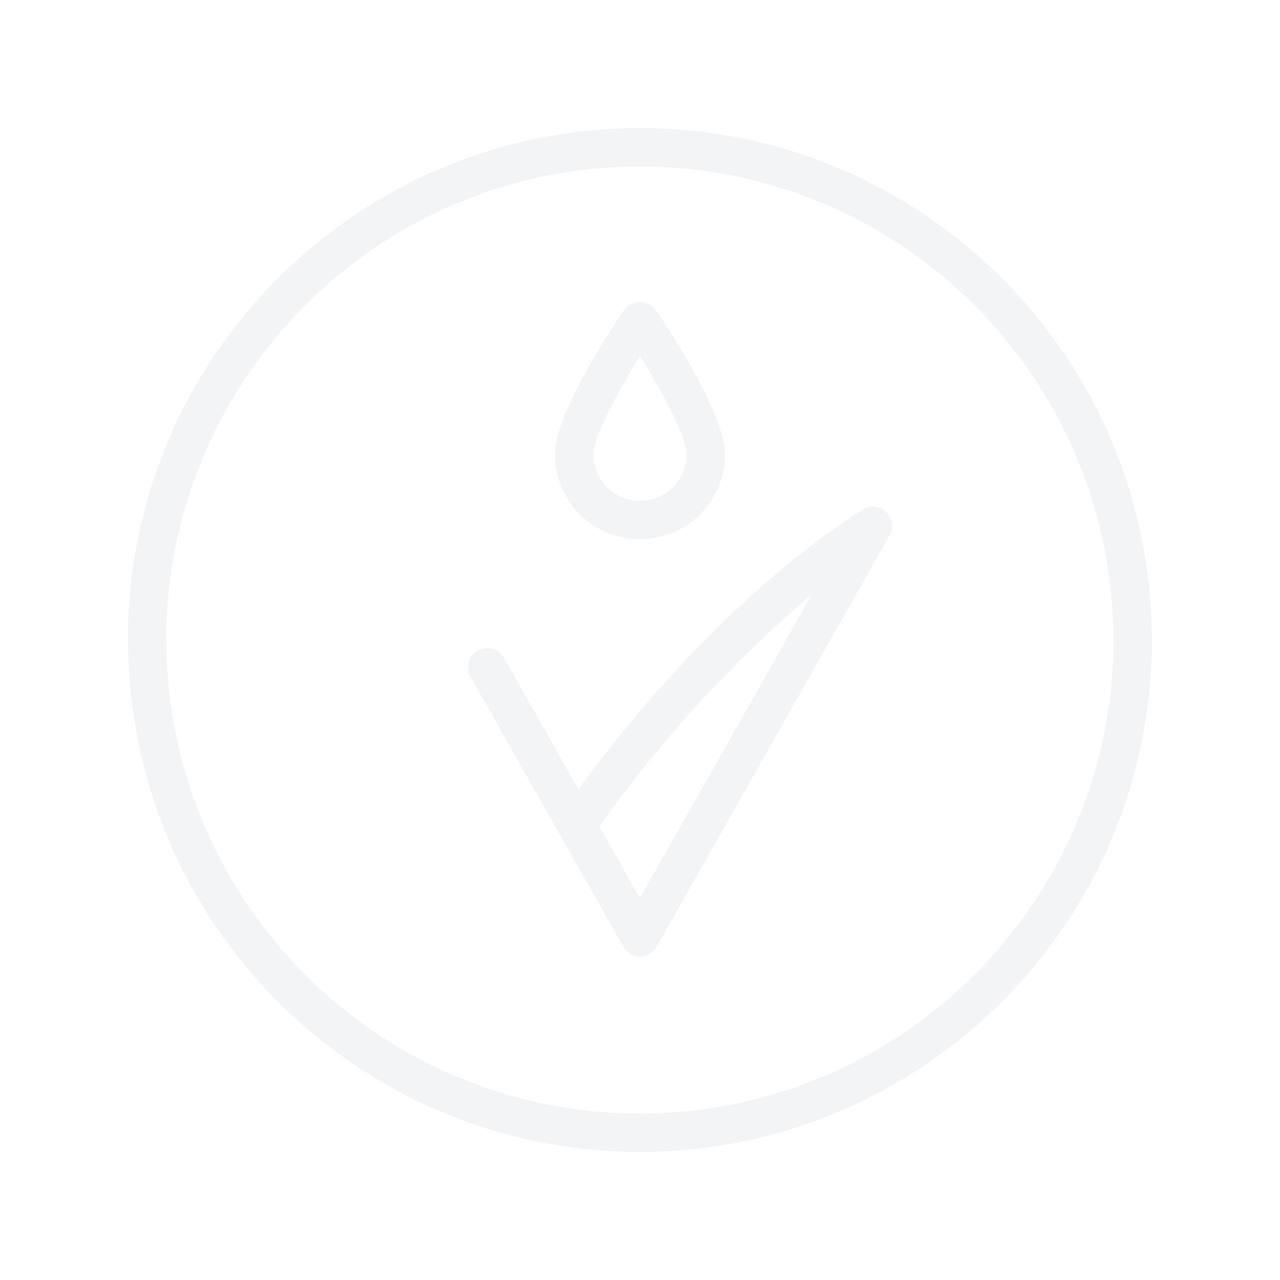 GOSH Slanted Waterproof Pro Liner No.001 Intense Black 3ml